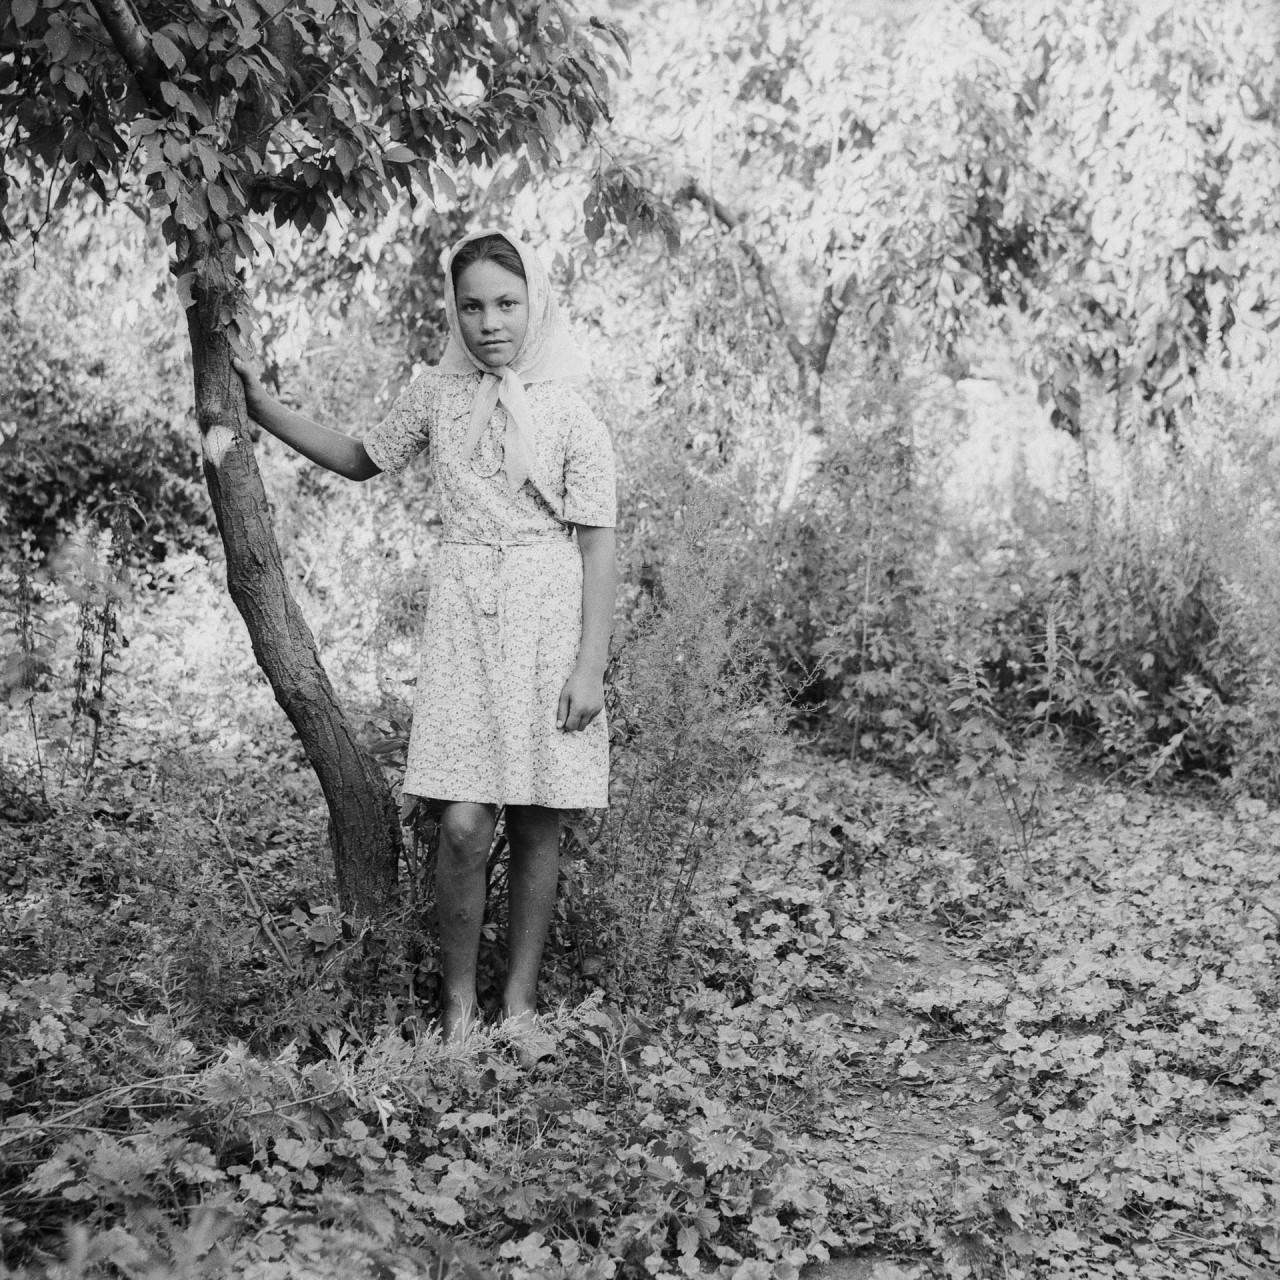 Архив сельского фотографа Захарии Кушнира (8)